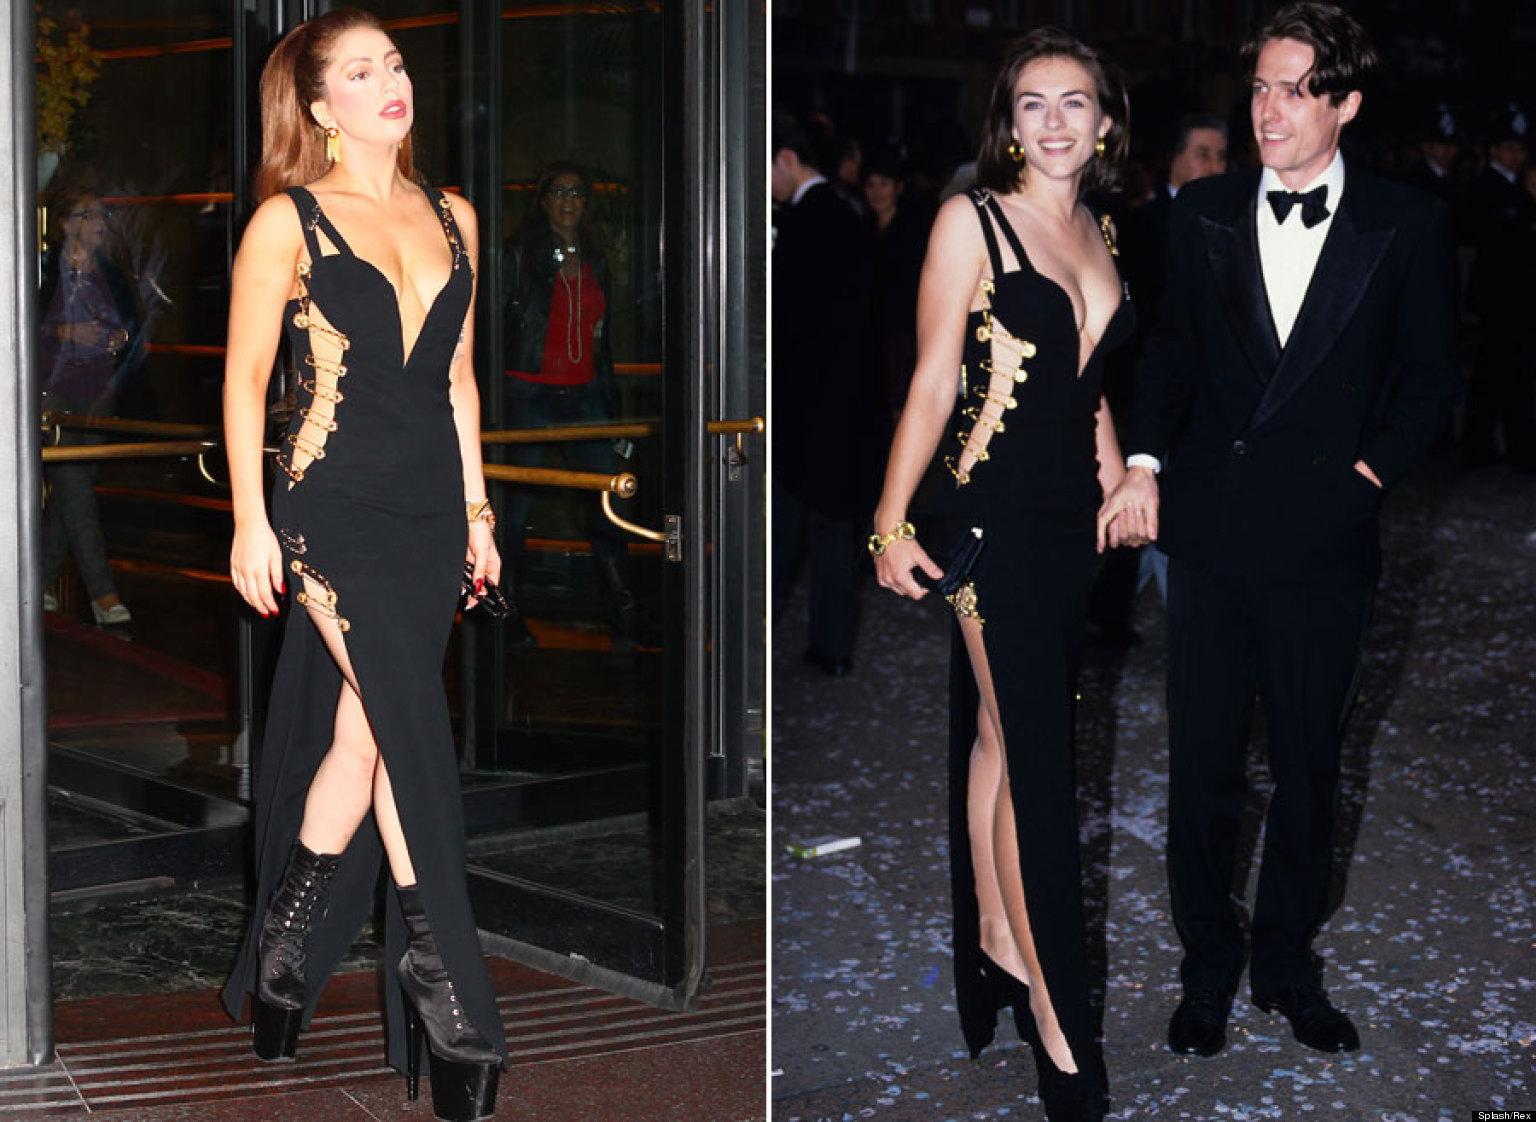 Liz hurley versace dress - Lady Gaga Channels Liz Hurley In Safety Pin Frock Pics Huffpost Uk